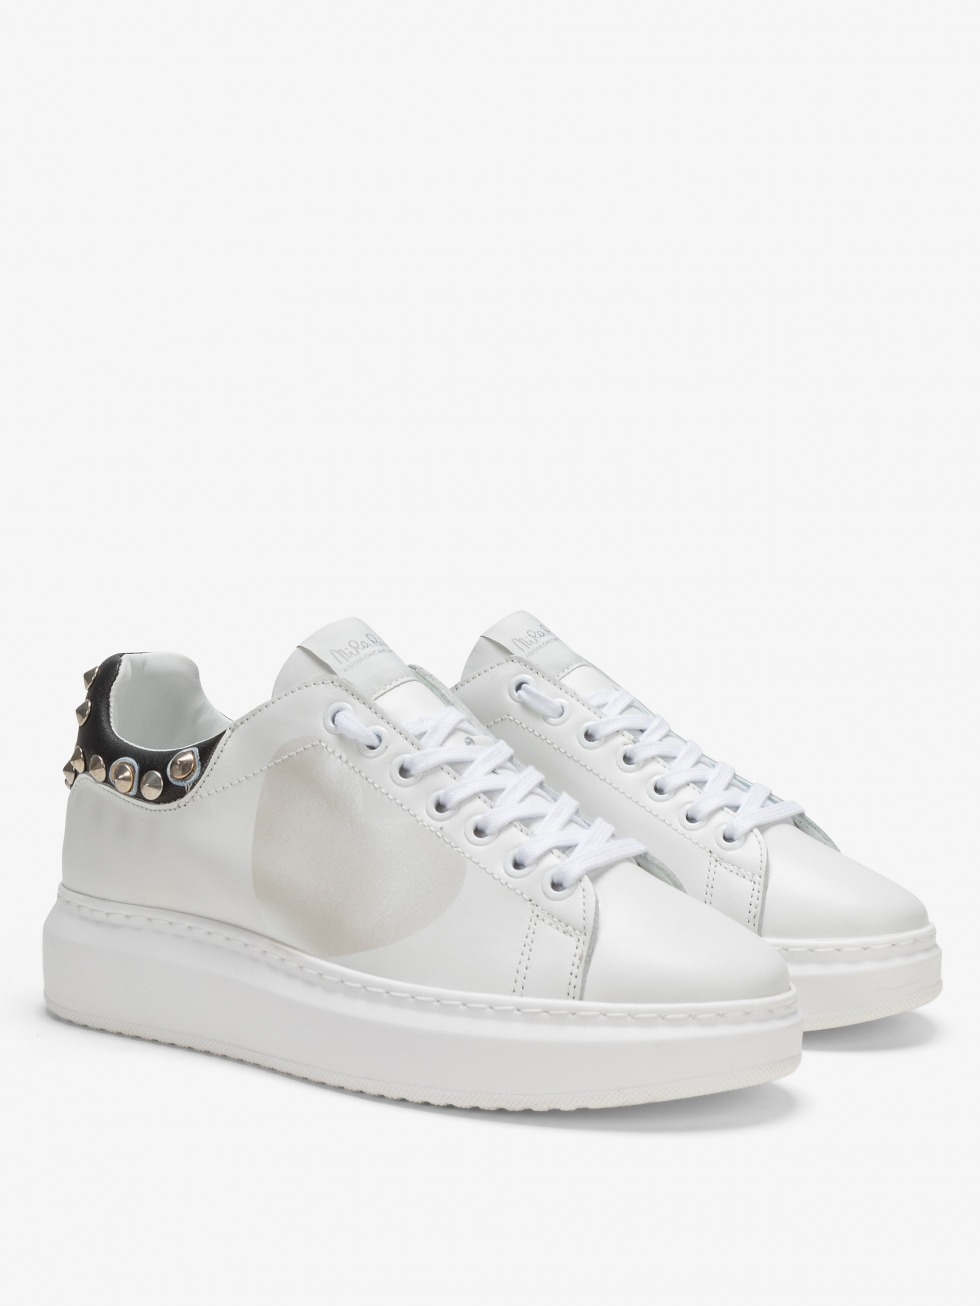 Angel Sneakers - White Rock Totem Heart